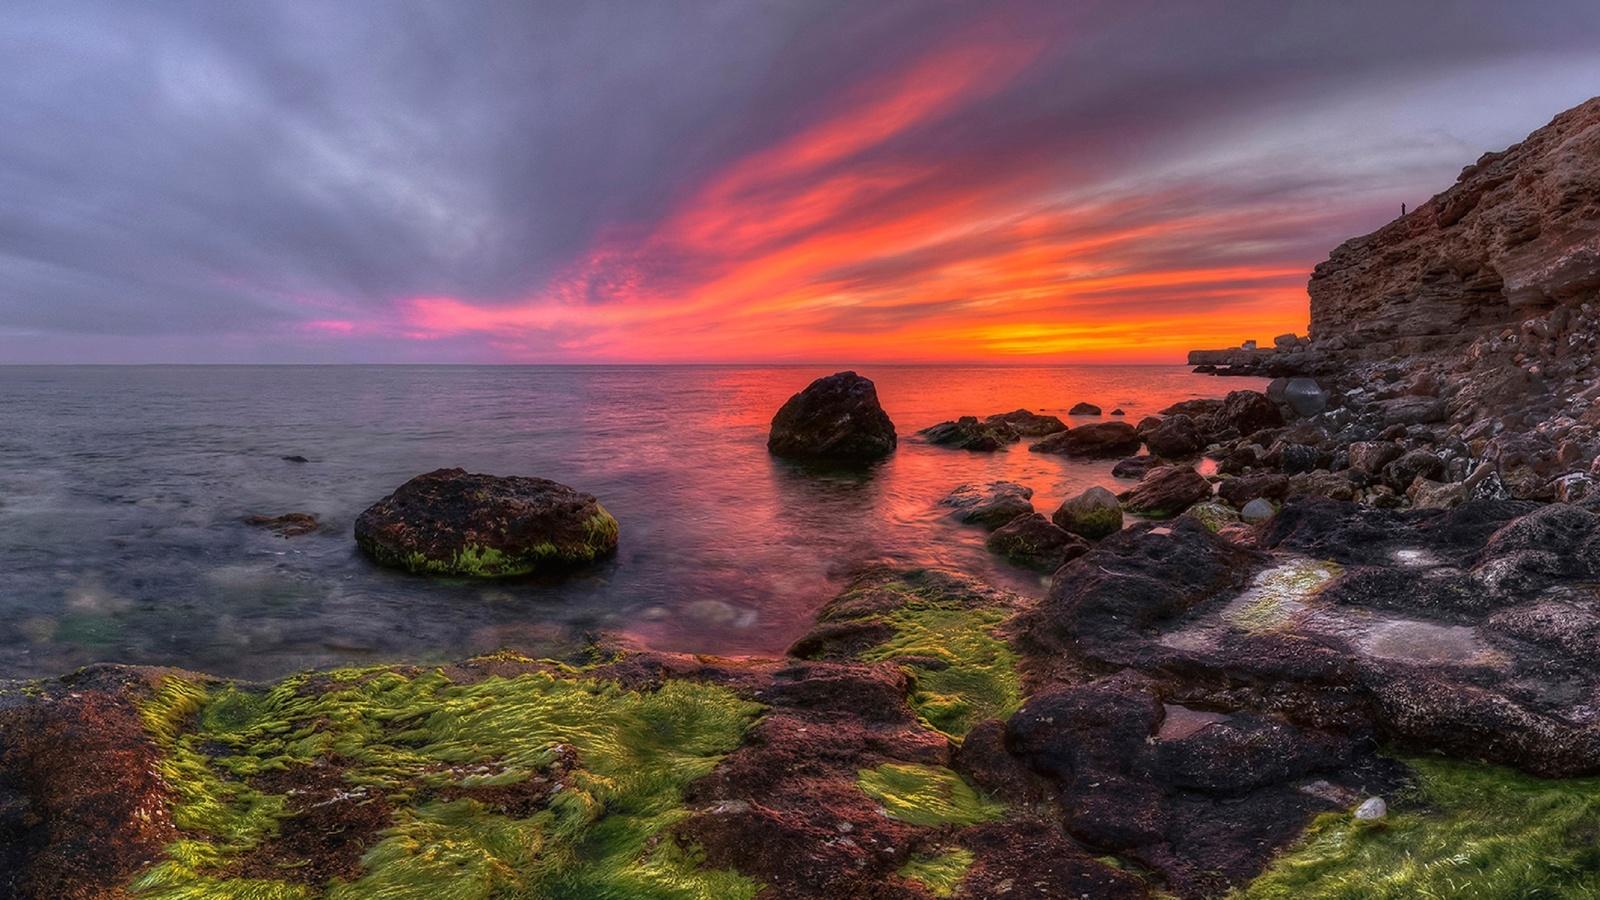 море, скалы, небо, закат, by корочкин андрей